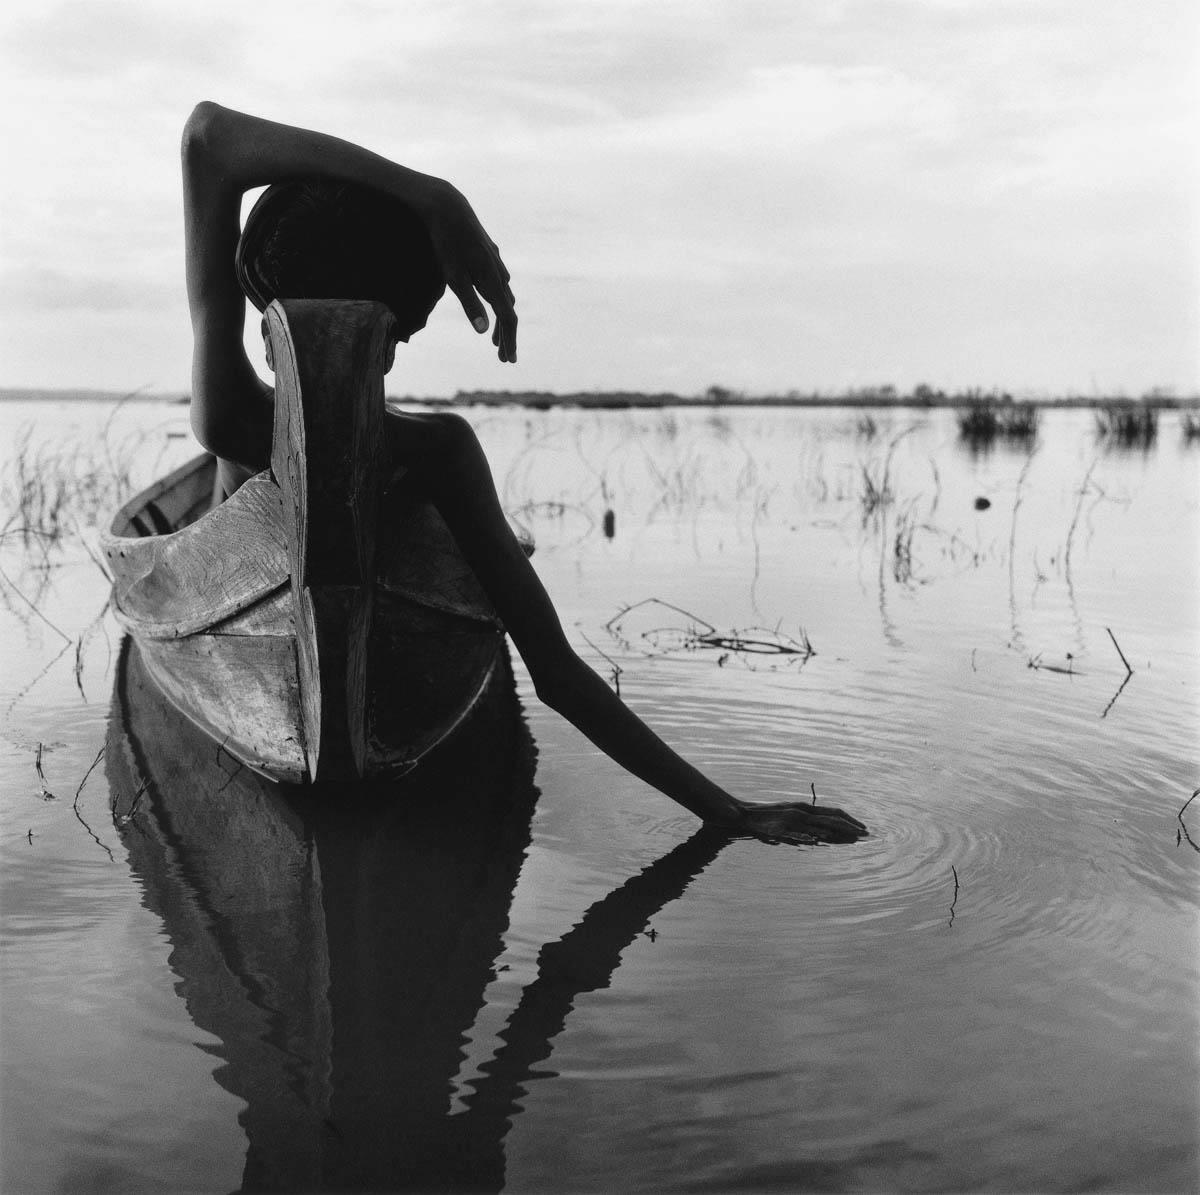 ContentintheShallows,Burma2008.jpg